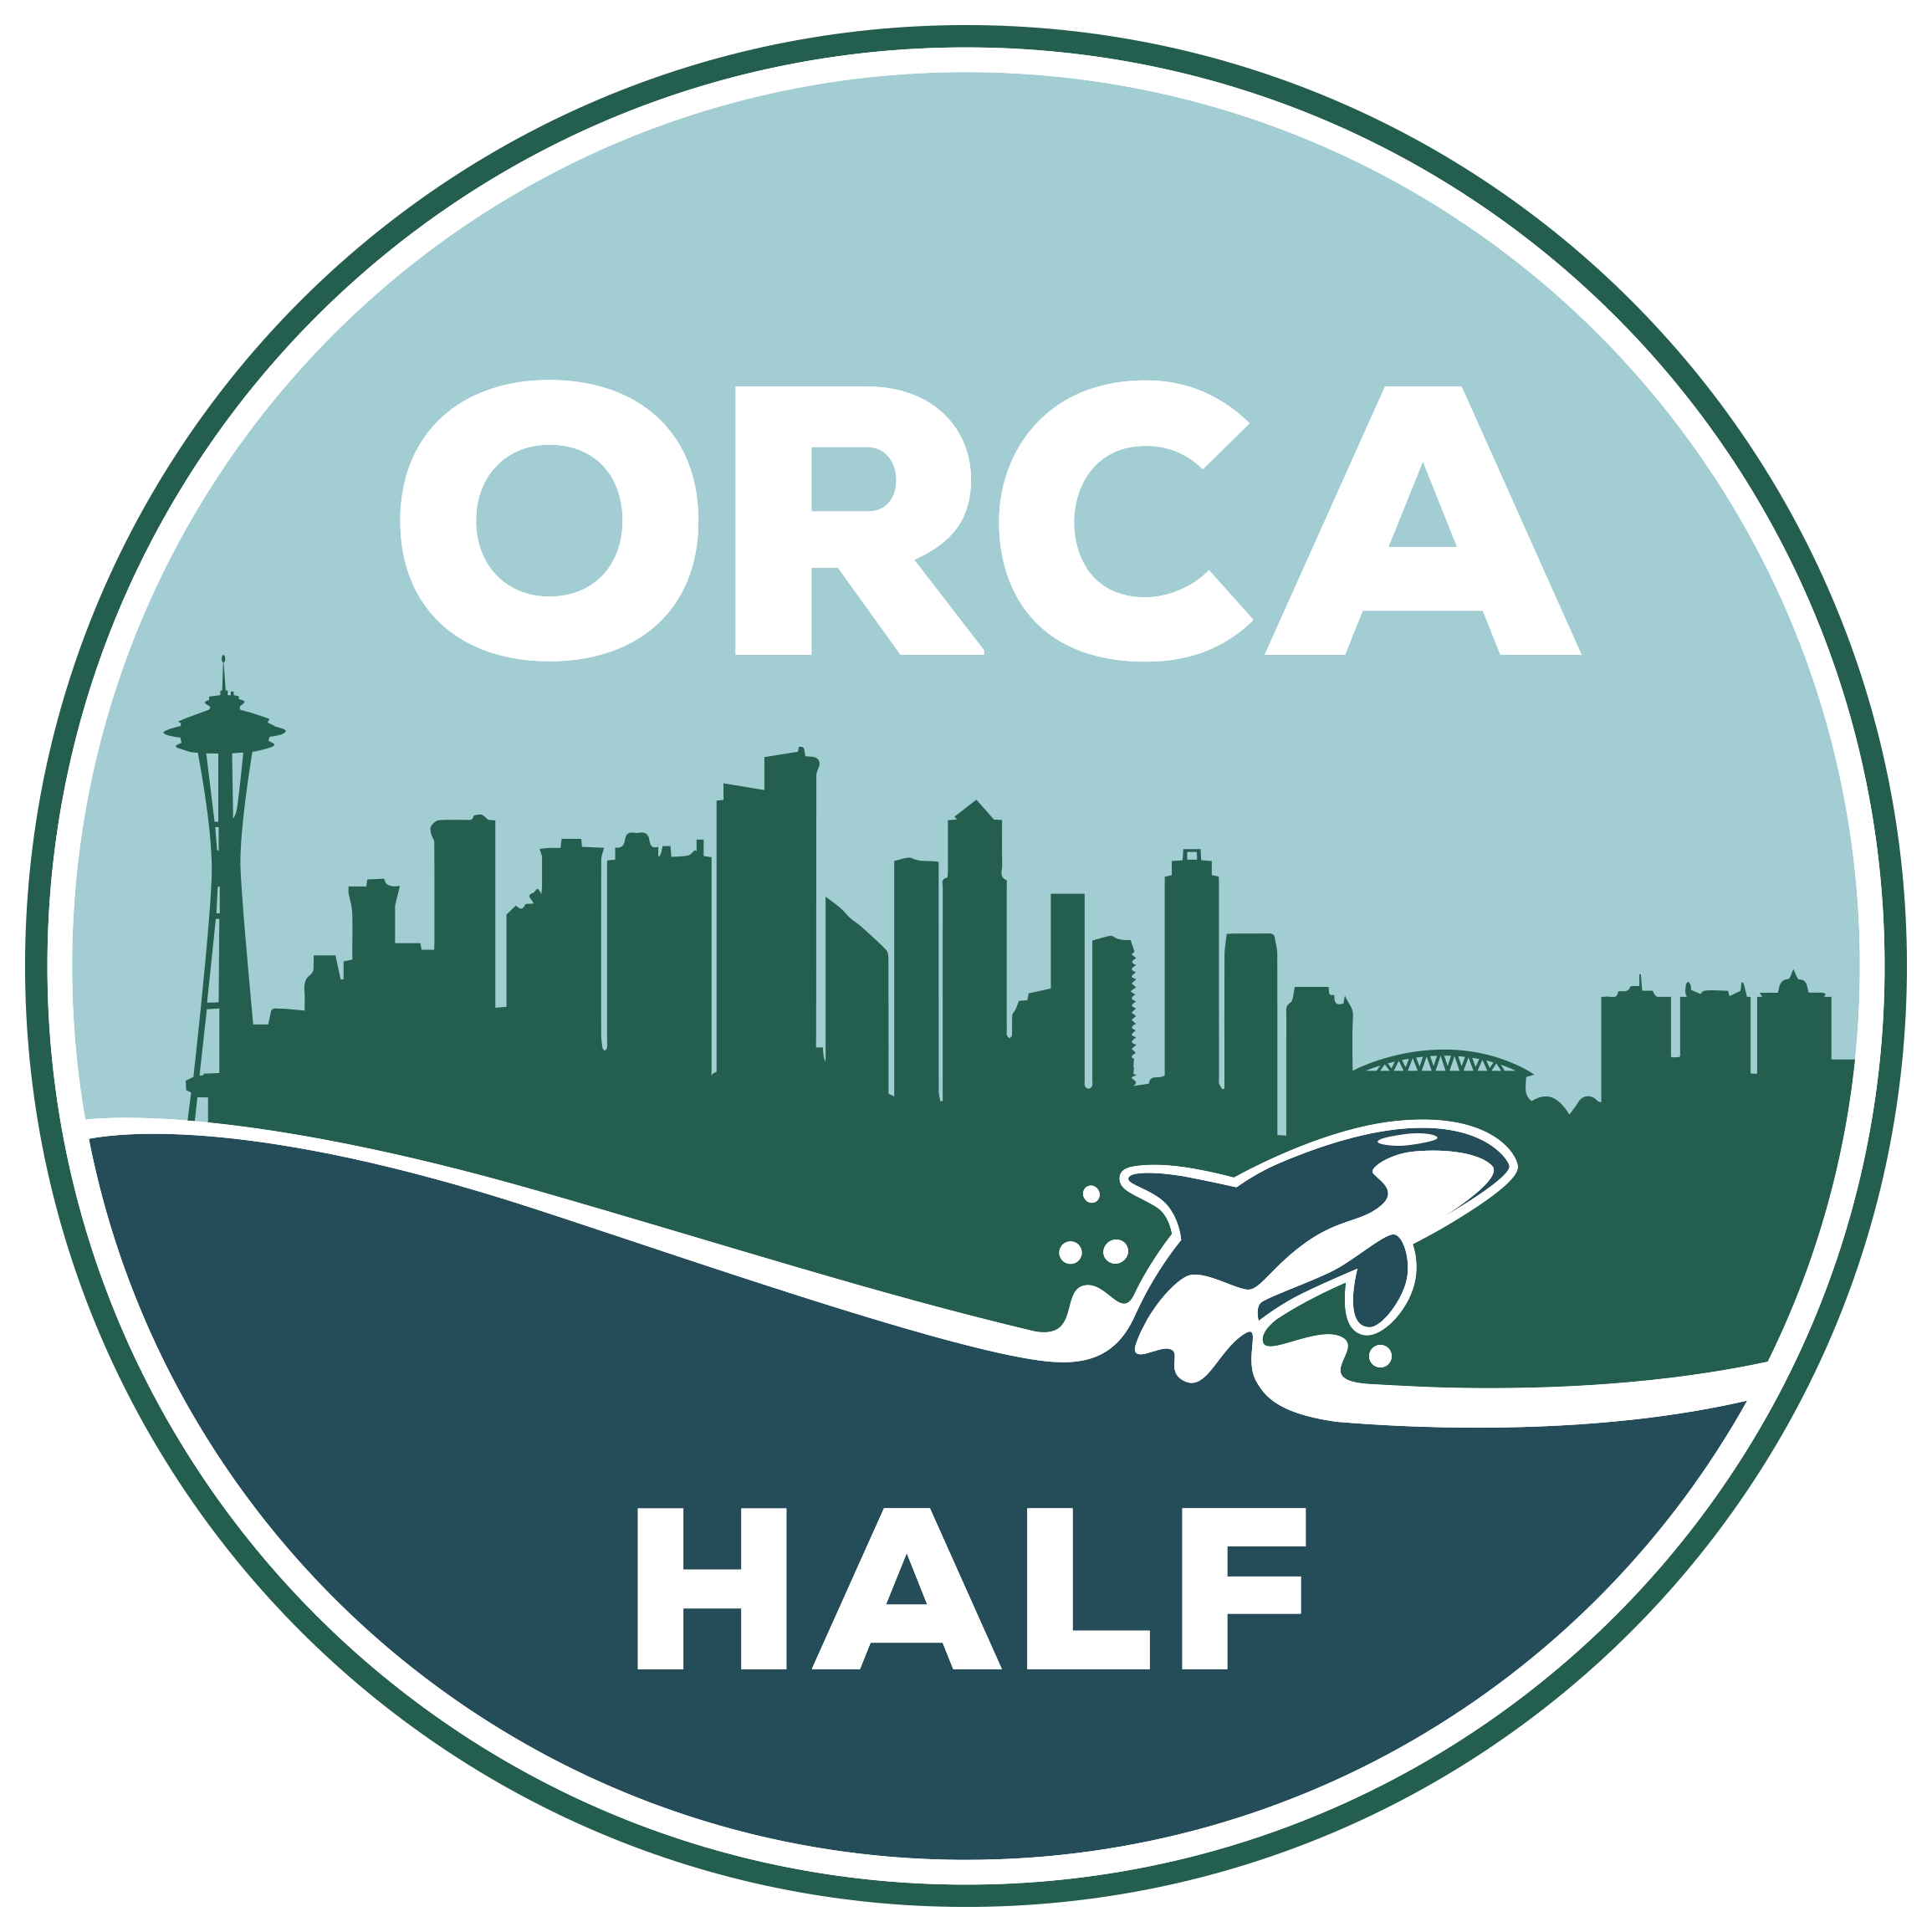 The Orca Half